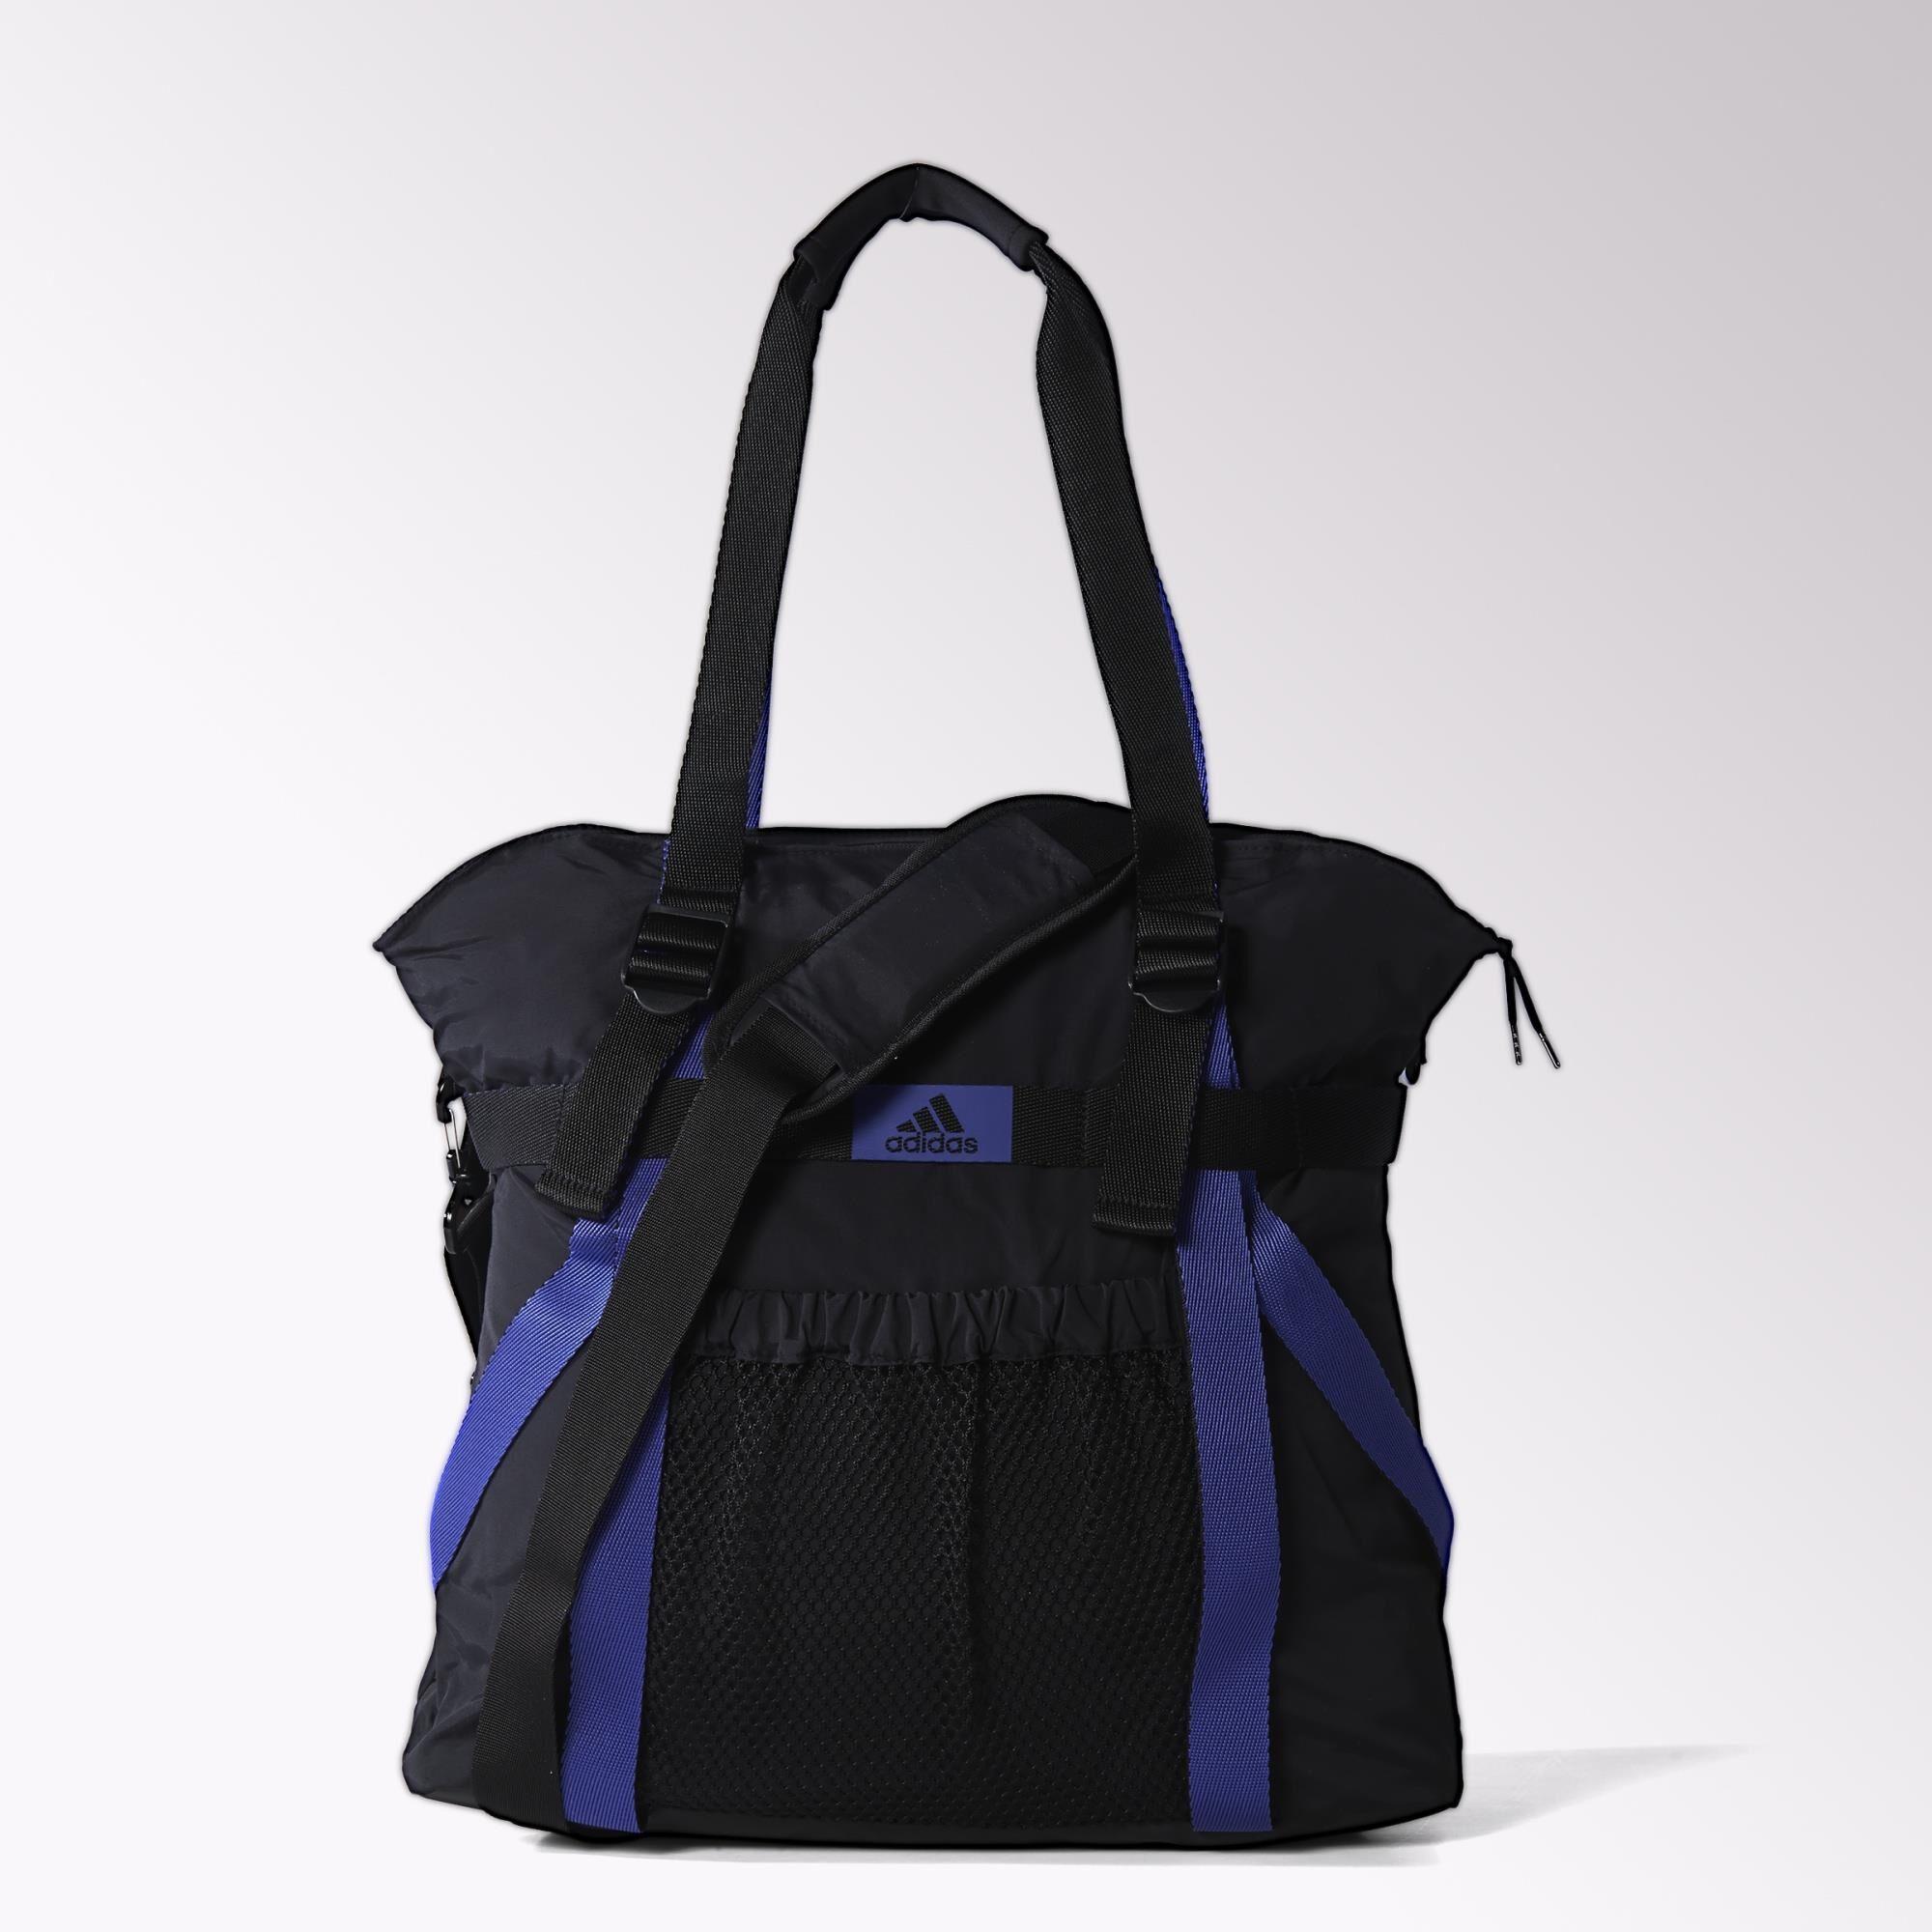 bolsos deportivos adidas mujer